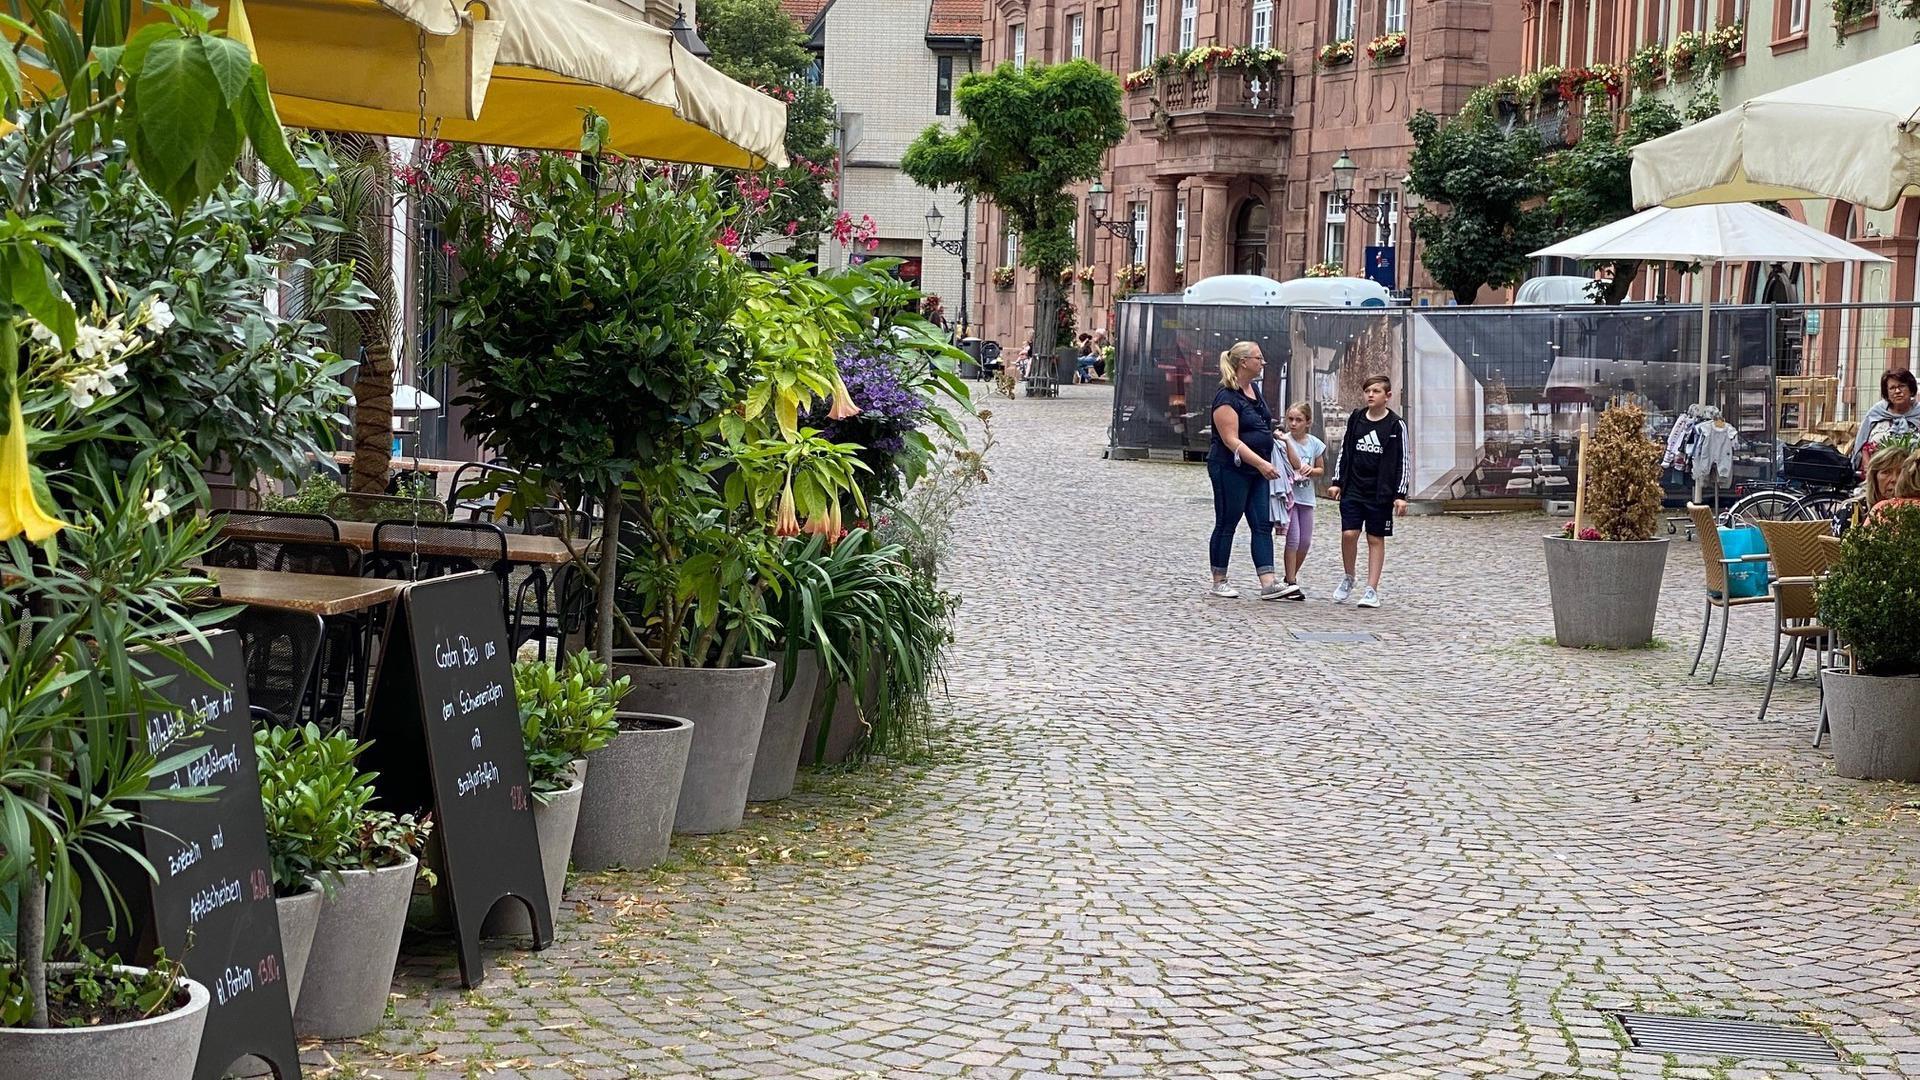 Durchgang zwischen Häusern Altstadt Ettlingen